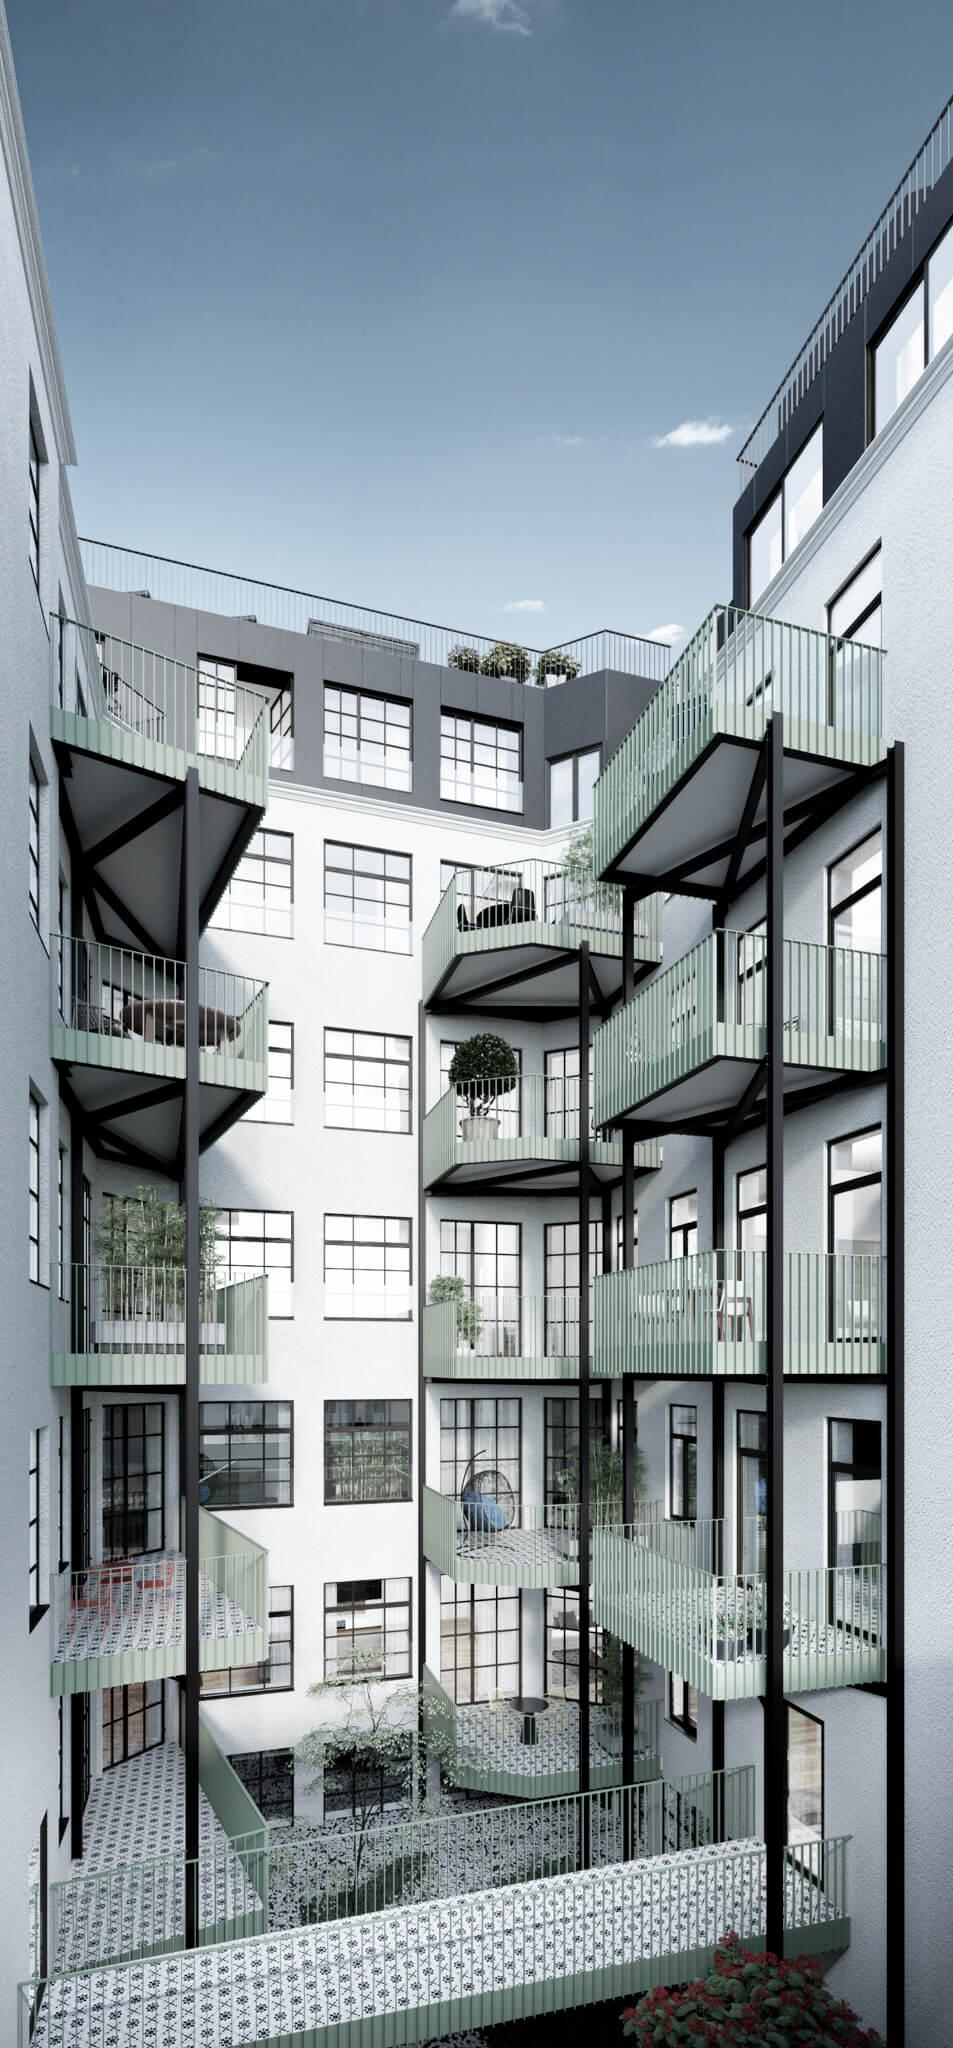 Kandlhof-kandlgasse-23-art-nouveau-innenhof-1070-wien-WK-Development